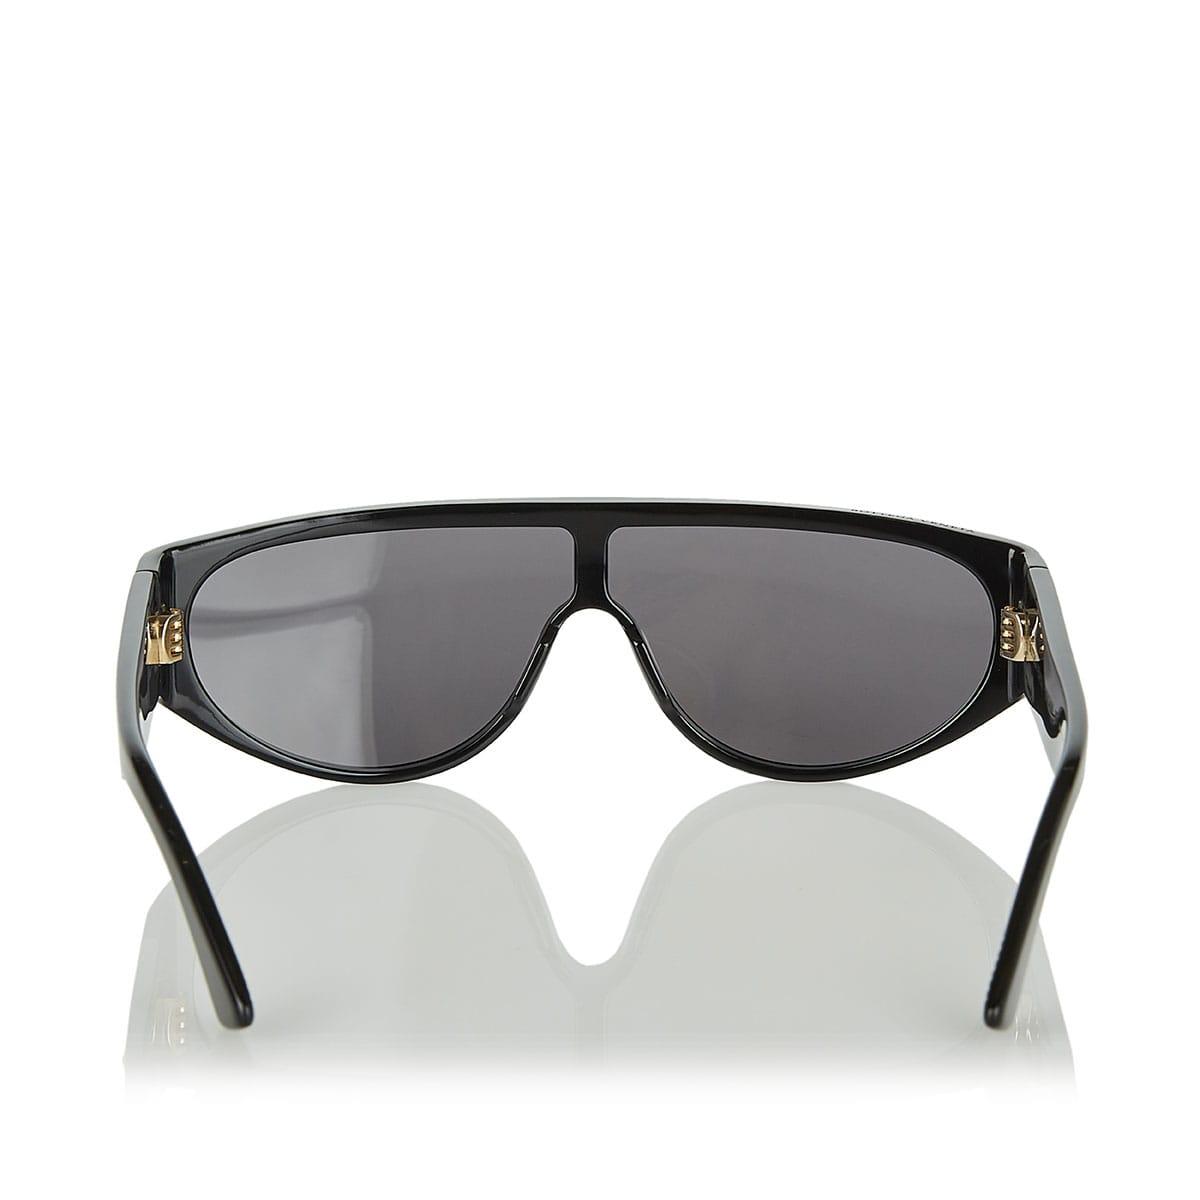 Acetate mask sunglasses